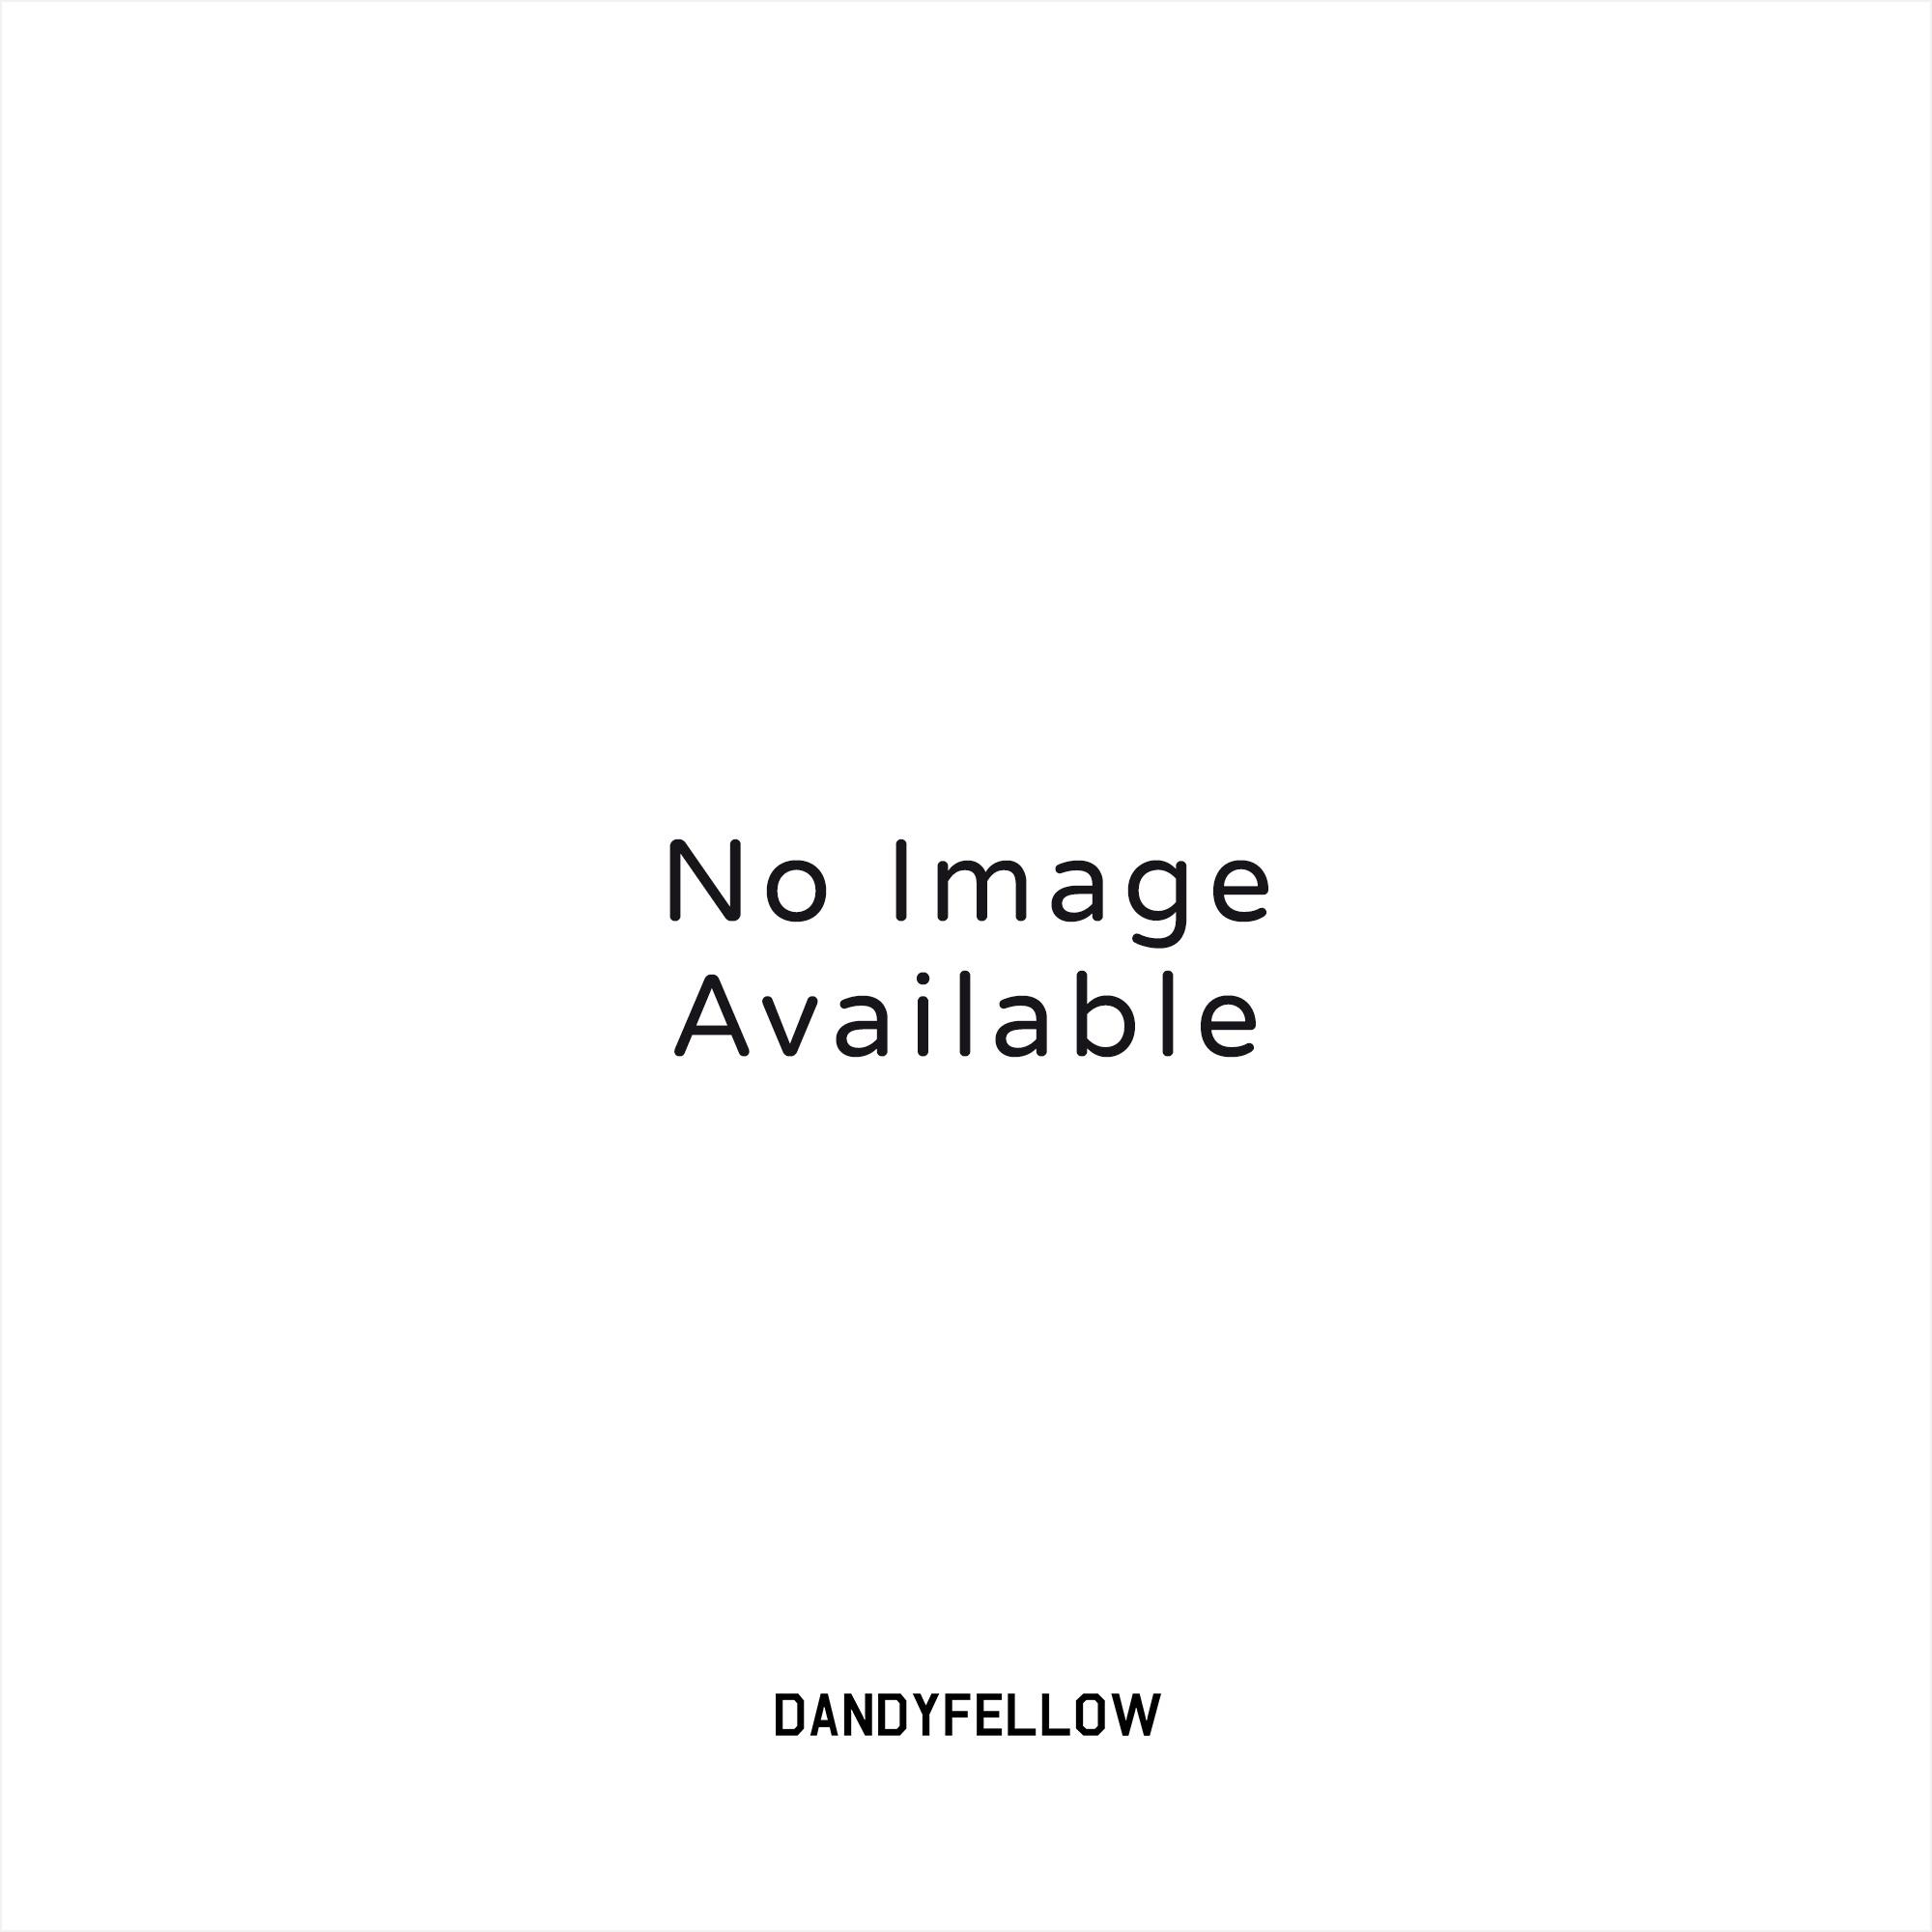 Ray Ban New Wayfarer Metal Effect Silver Sunglasses 0RB2132-614440